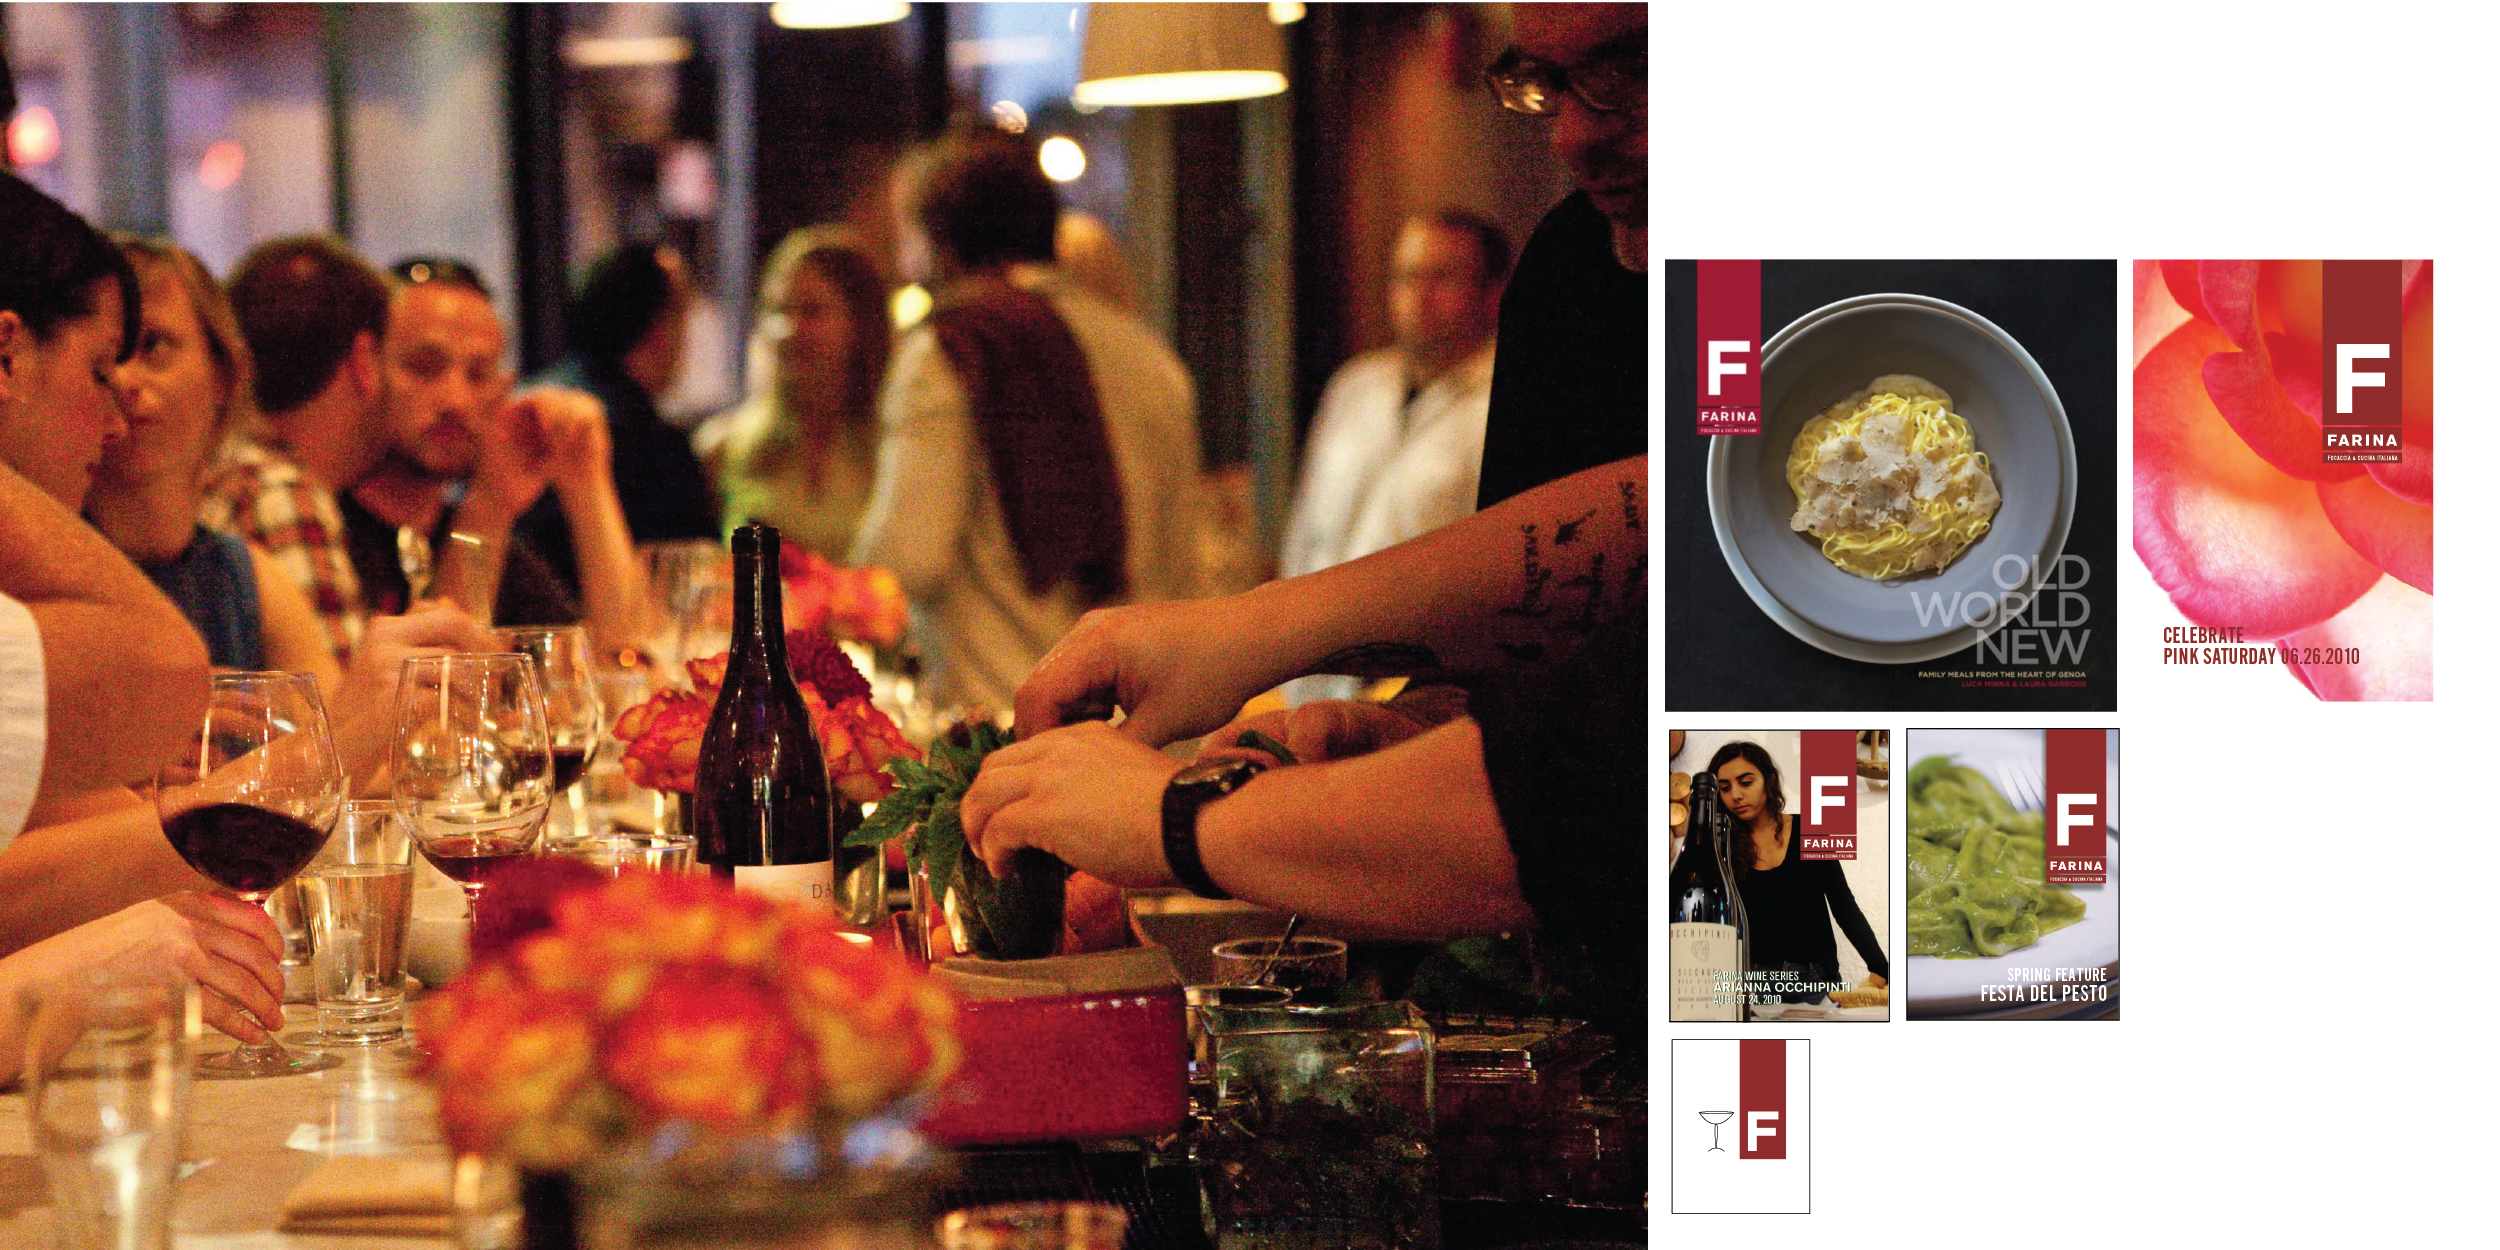 - QUARTERLY EVENTSWINEMAKER DINNERSMARKETING COMMUNICATIONSICONOGRAPHY OLD WORLD NEW COOKBOOK